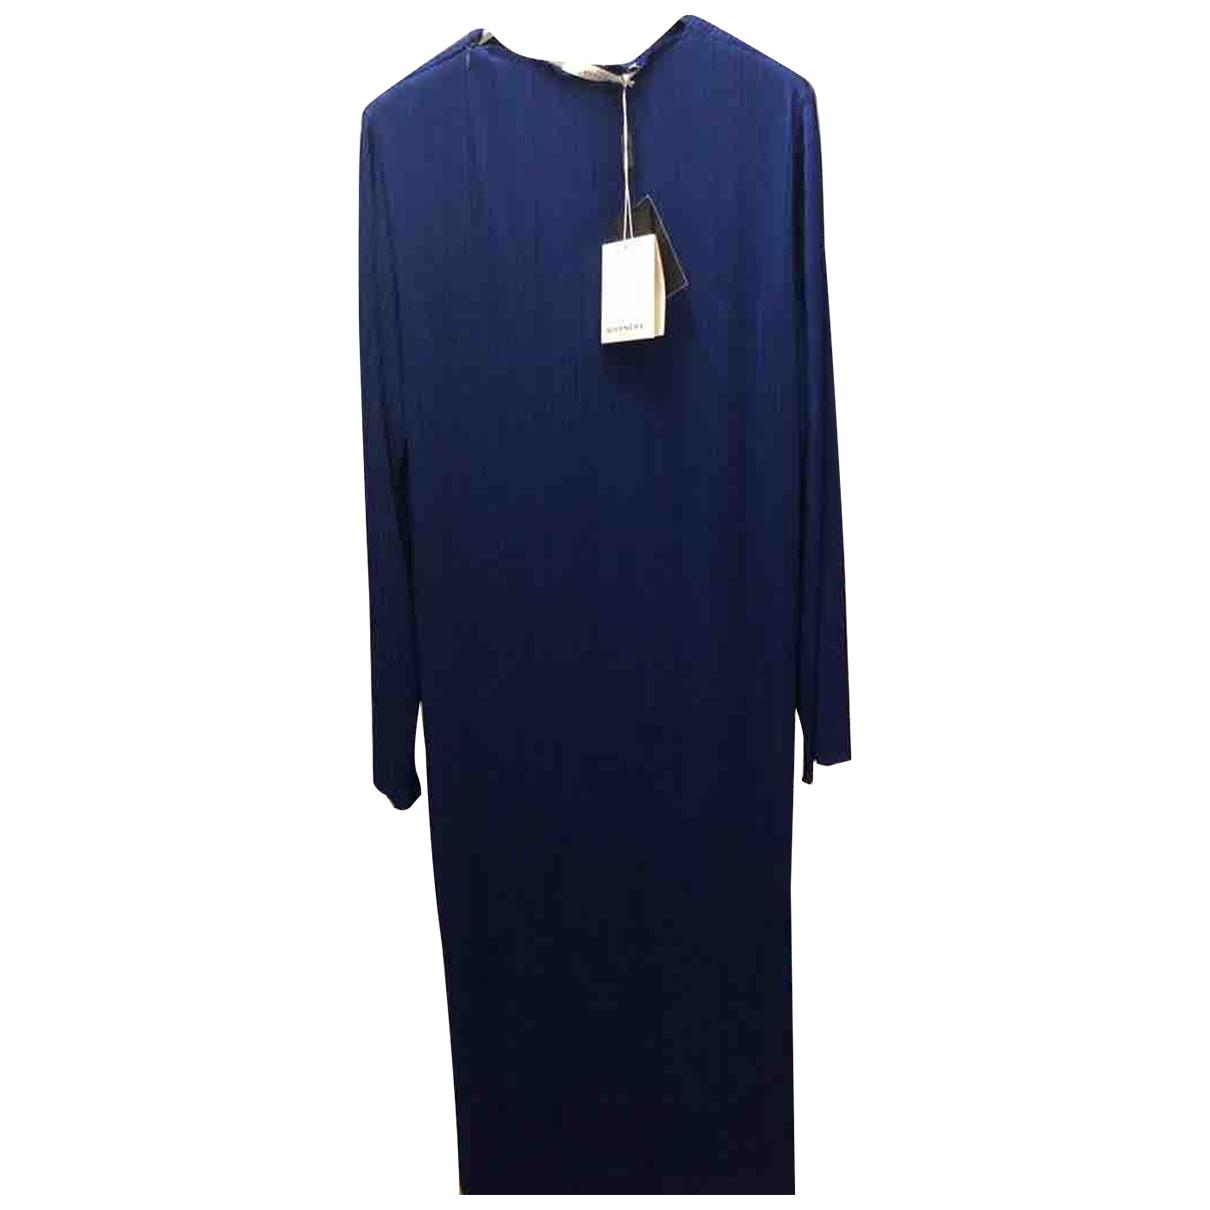 Givenchy \N Kleid in  Blau Polyester